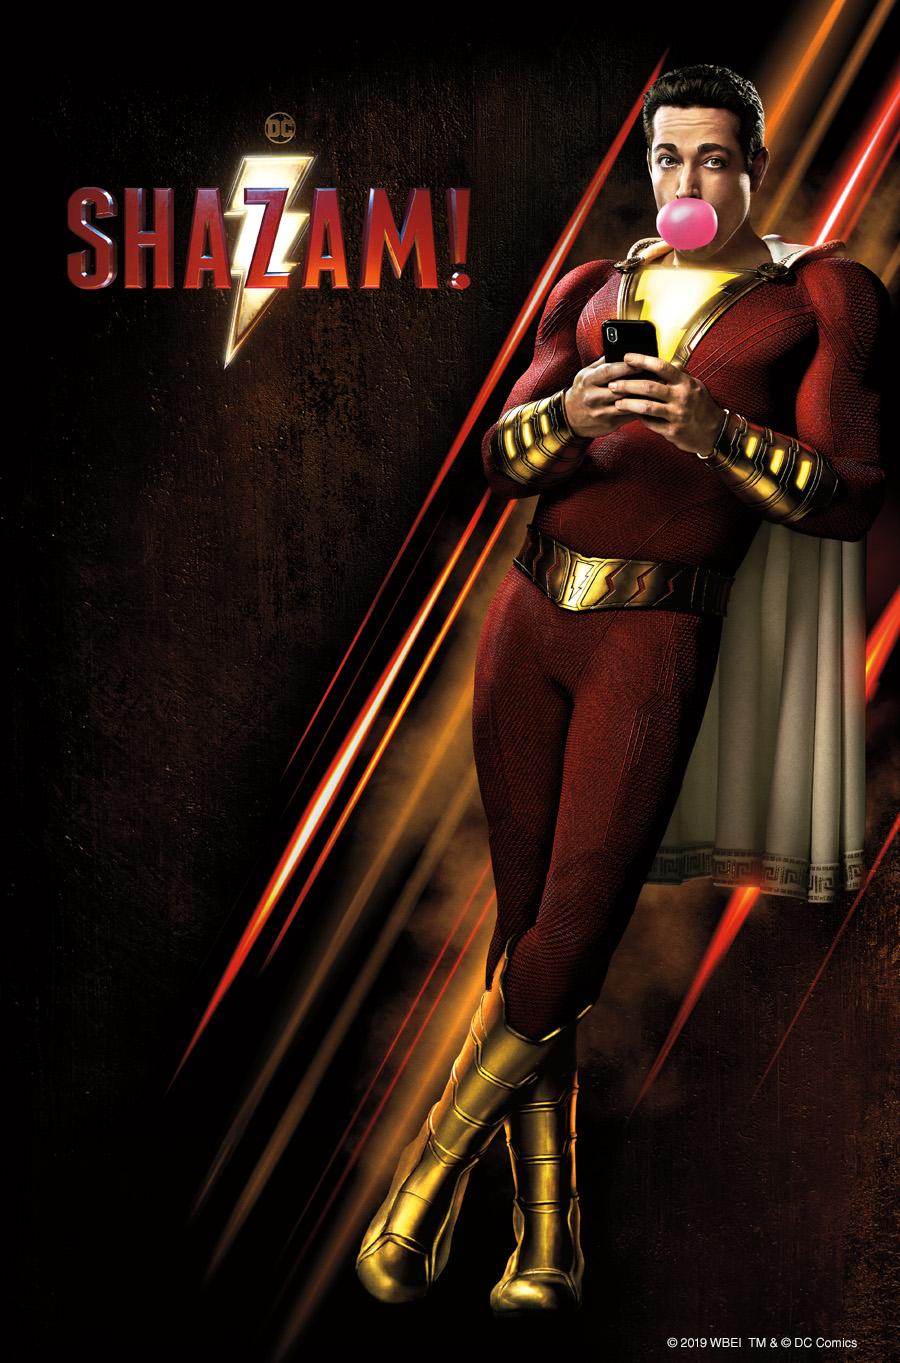 August 16, Shazam!